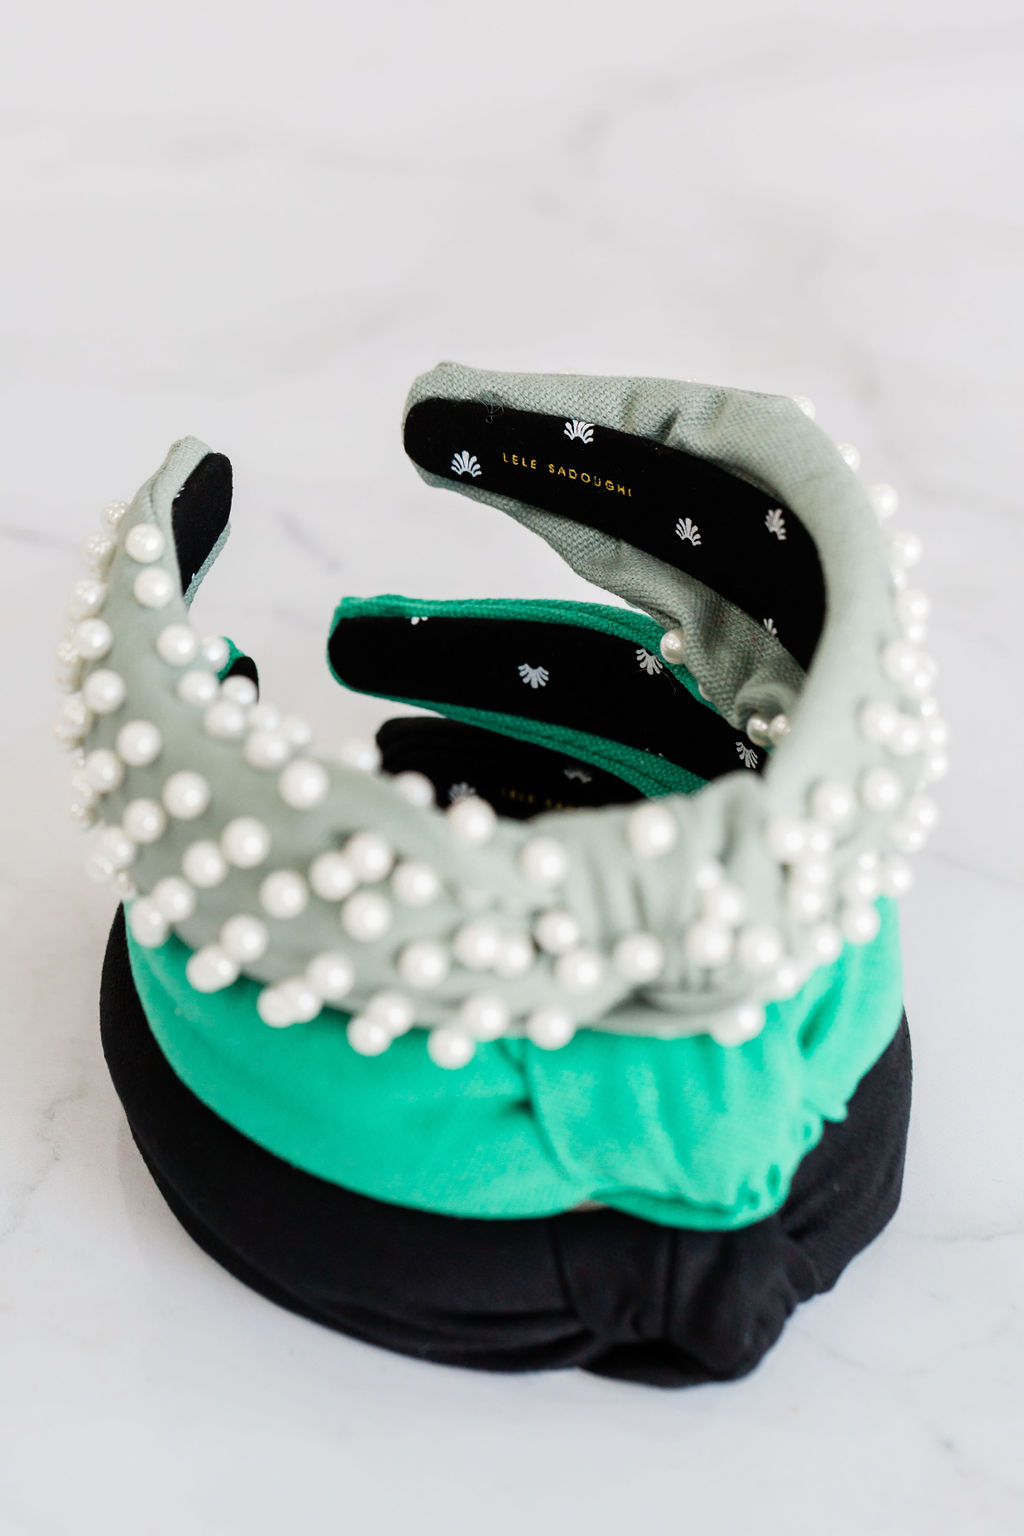 Lele Sadoughi Headbands - lelesadoughi.com